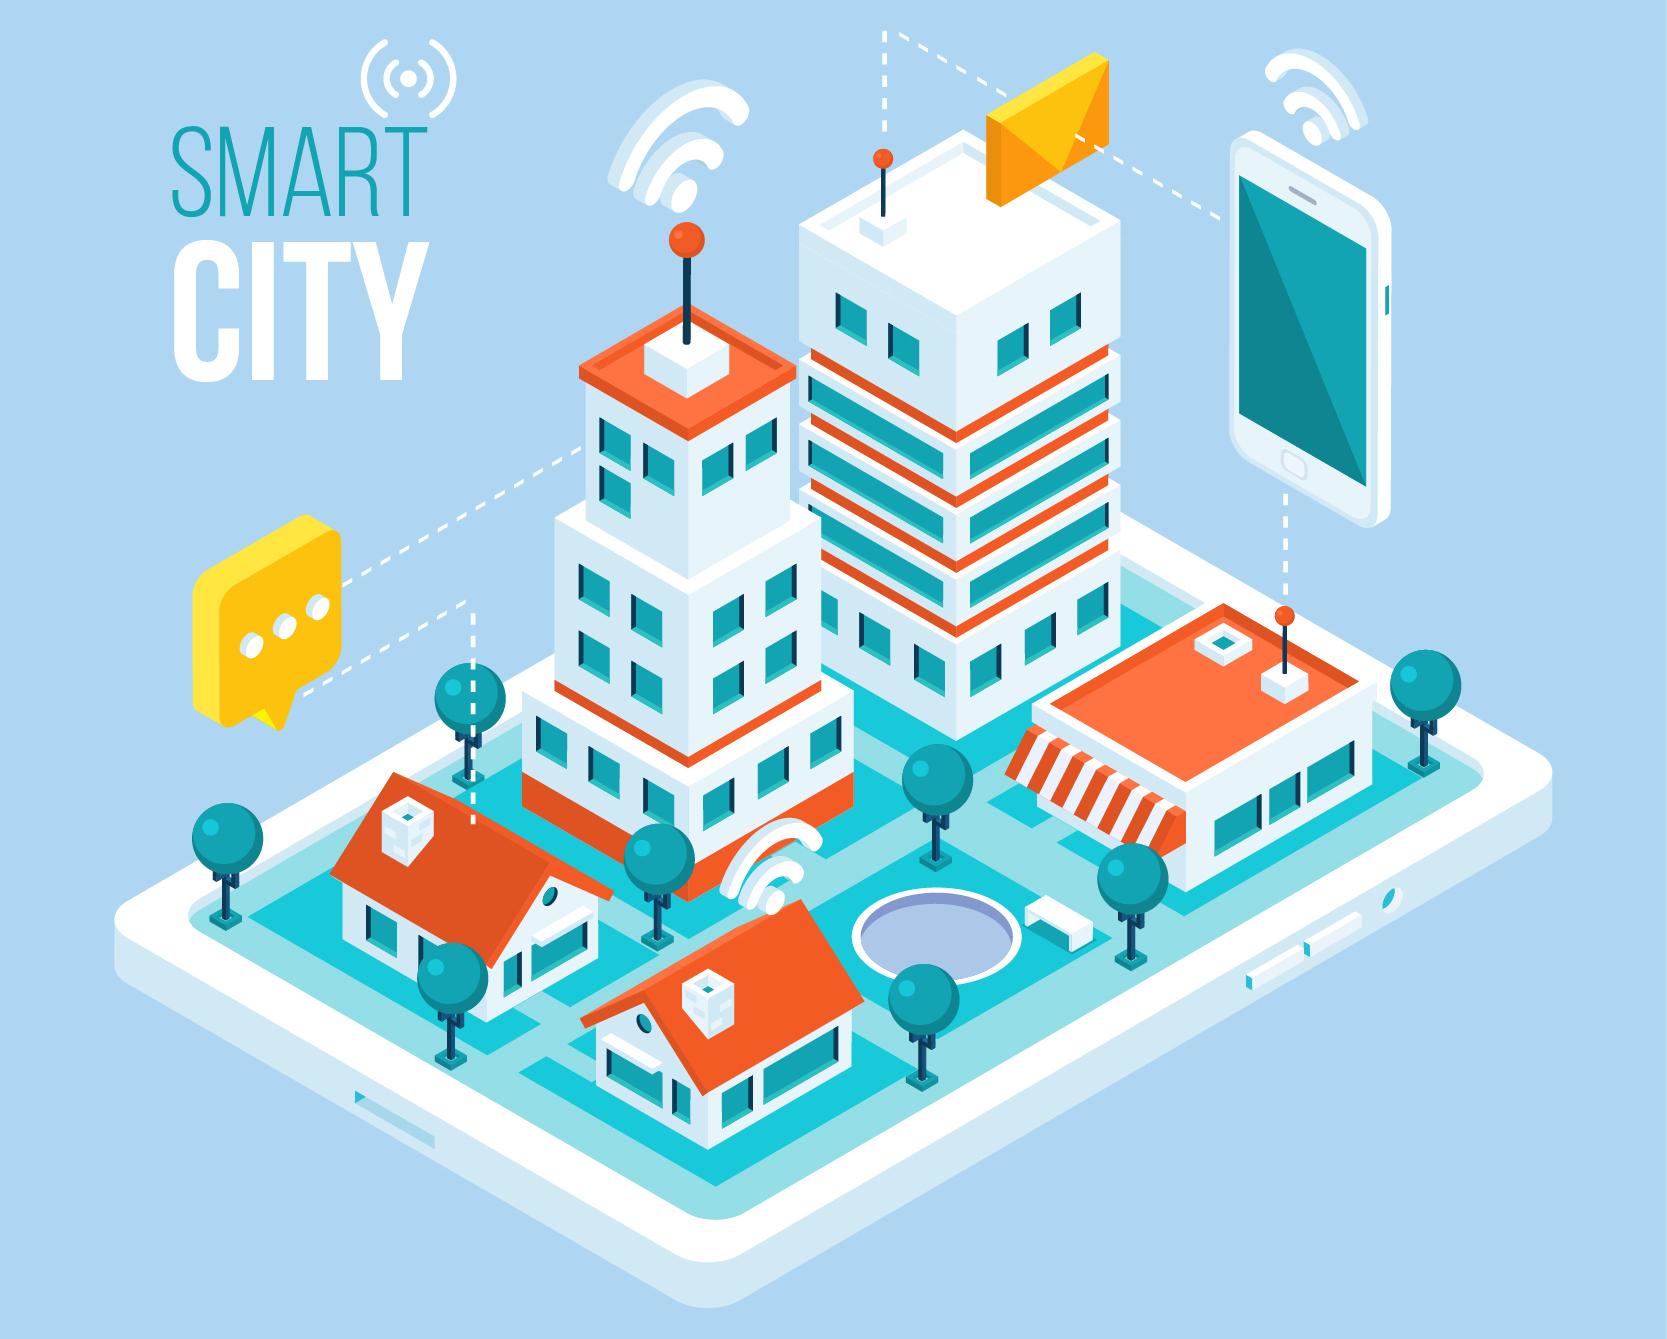 Smart City Brumath